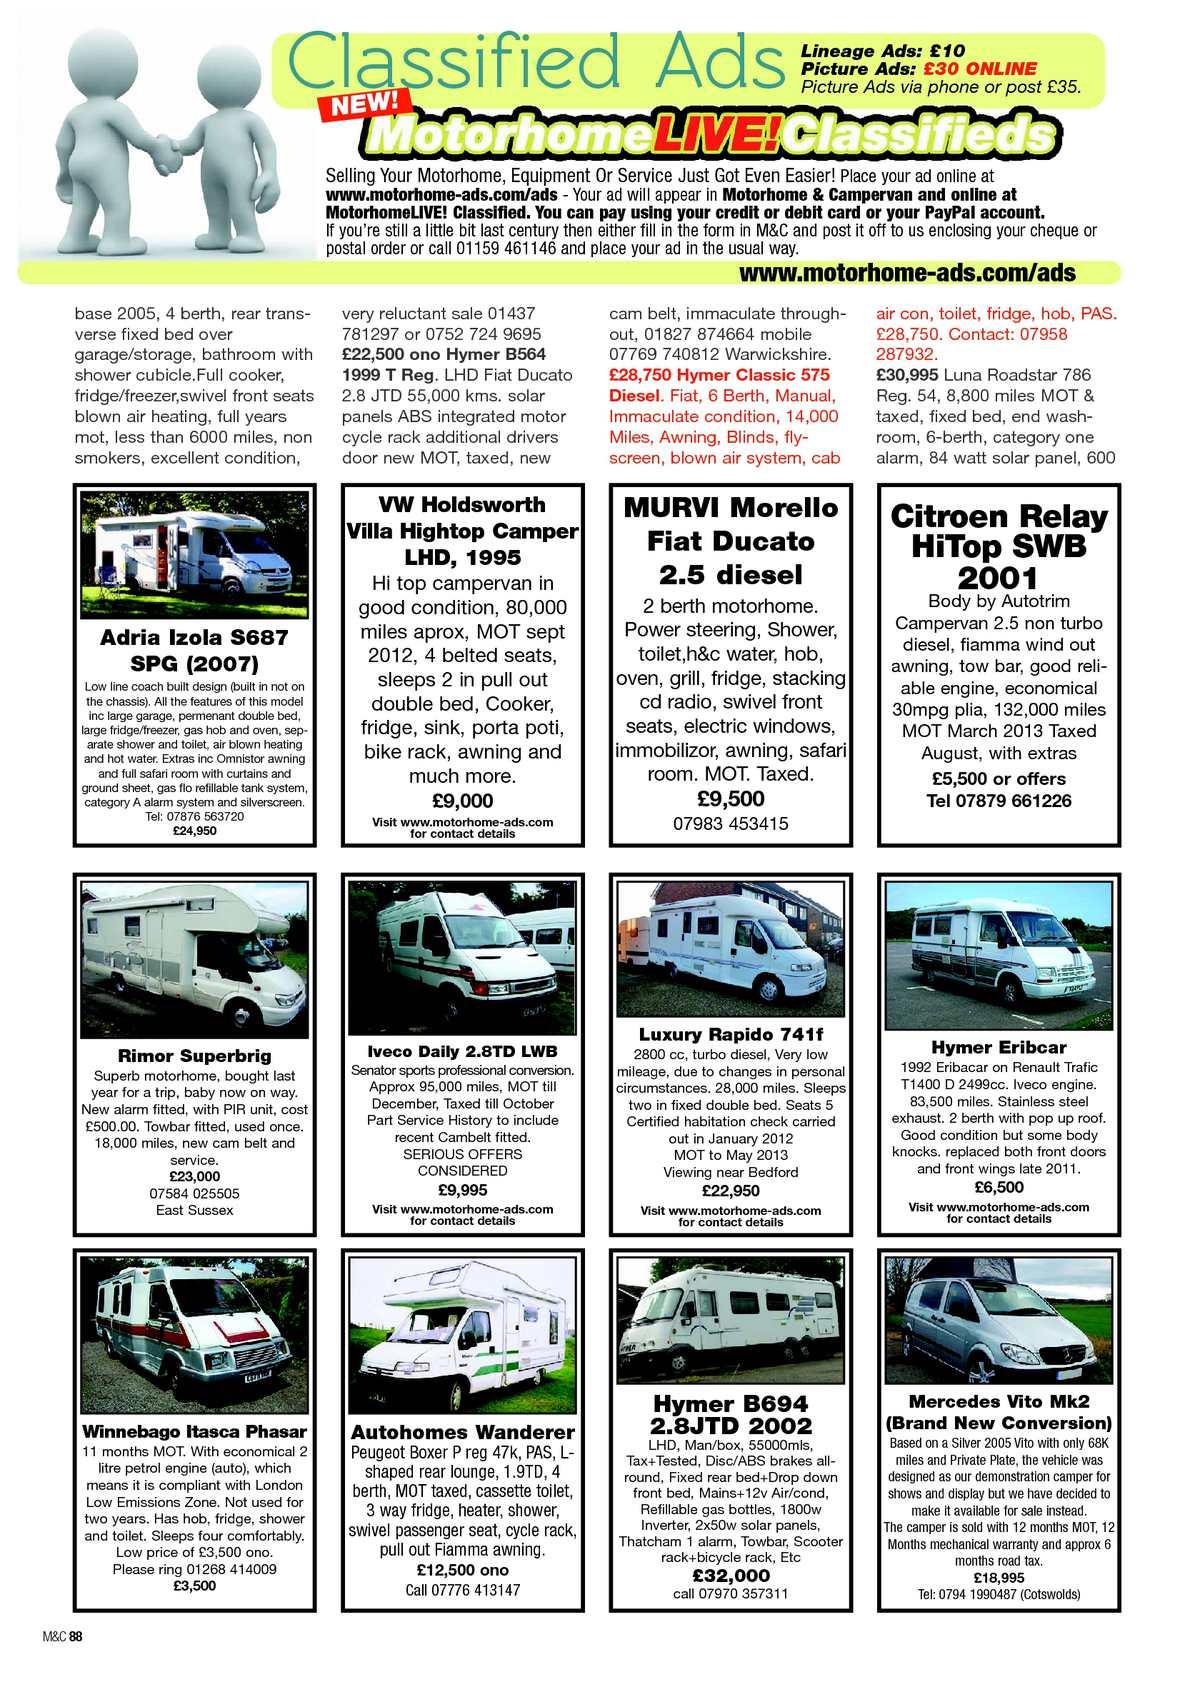 Feb 2013 motorhome campervan calameo downloader page 90 fandeluxe Gallery